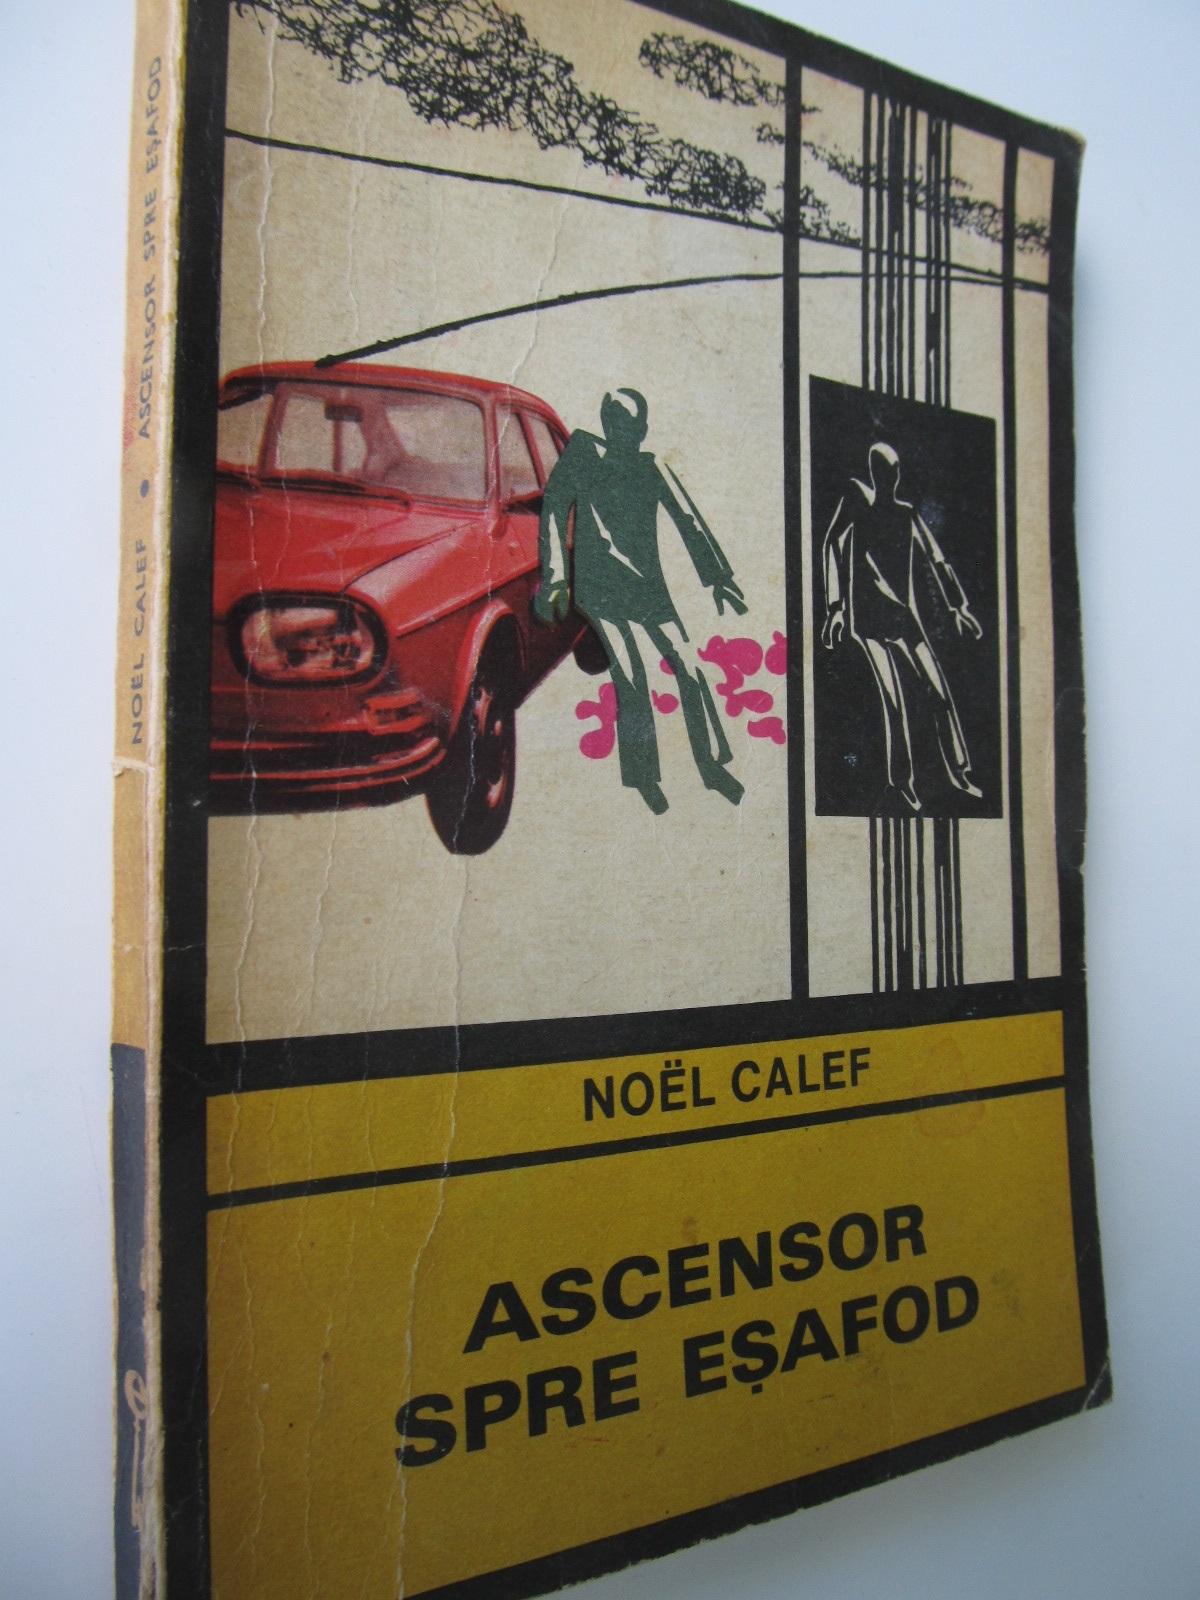 Ascensor spre esafod - Noel Calef | Detalii carte